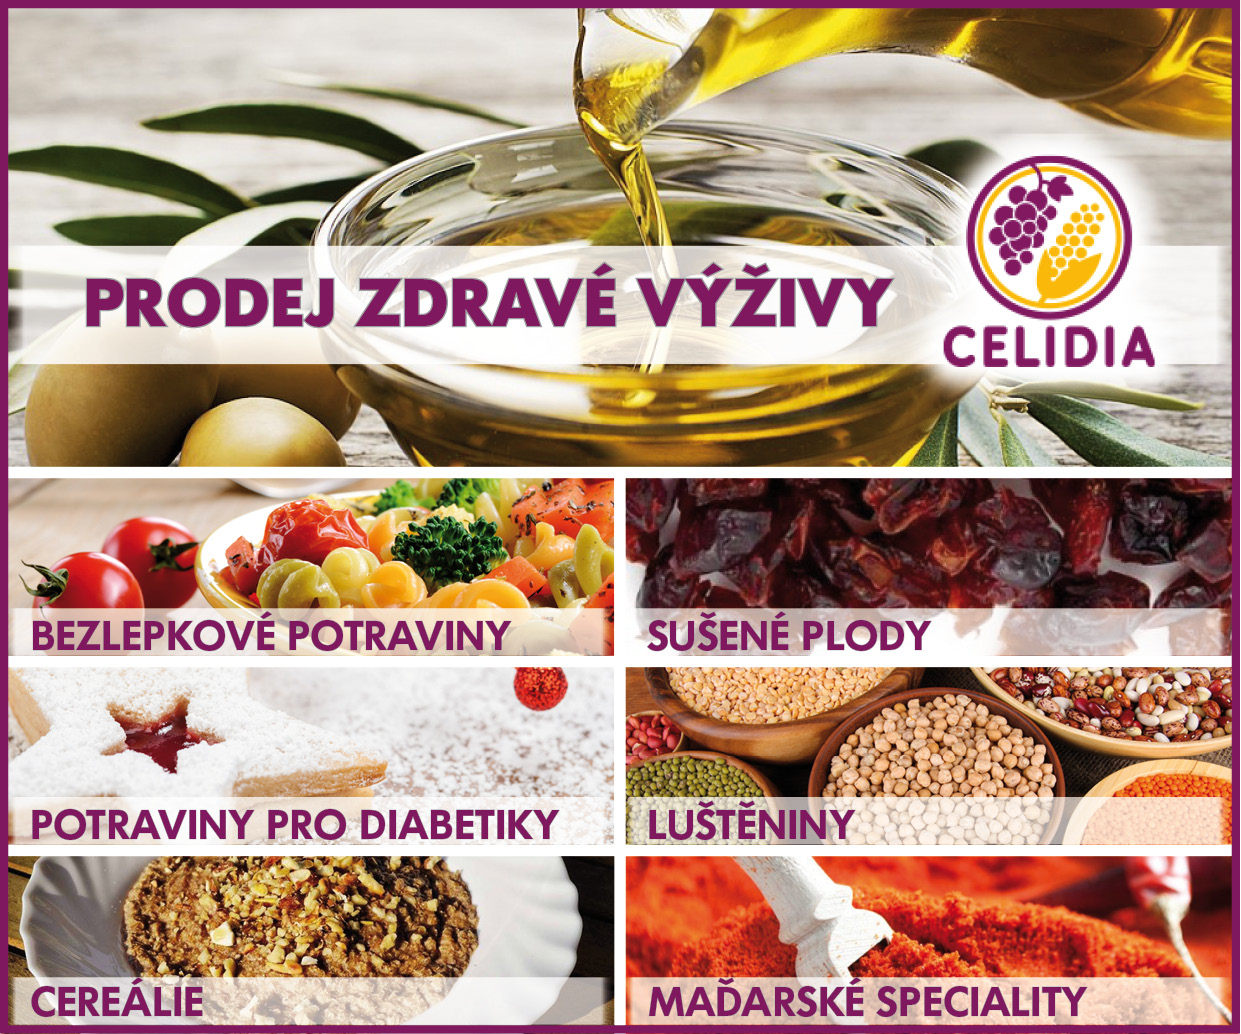 Prodej zdravé výživy, bezlepkových potravin a potravin pro diabetiky – eshop Celidia.cz